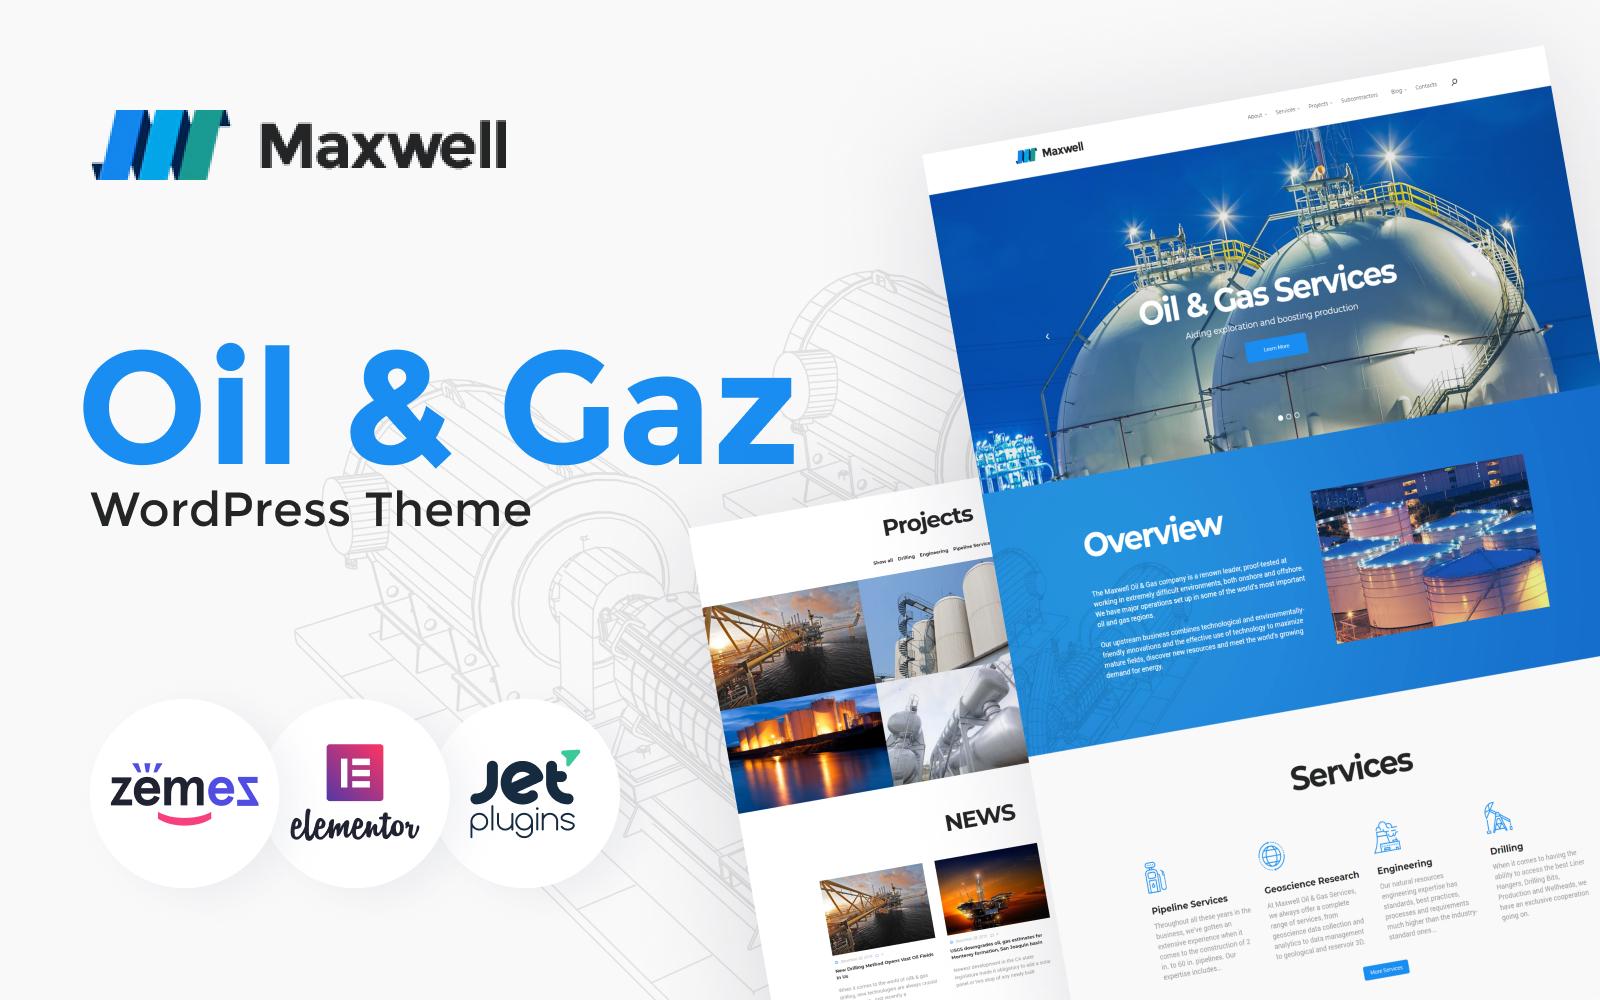 """Maxwell - Compagnie Pétrolière et Gazière"" thème WordPress adaptatif #62356"